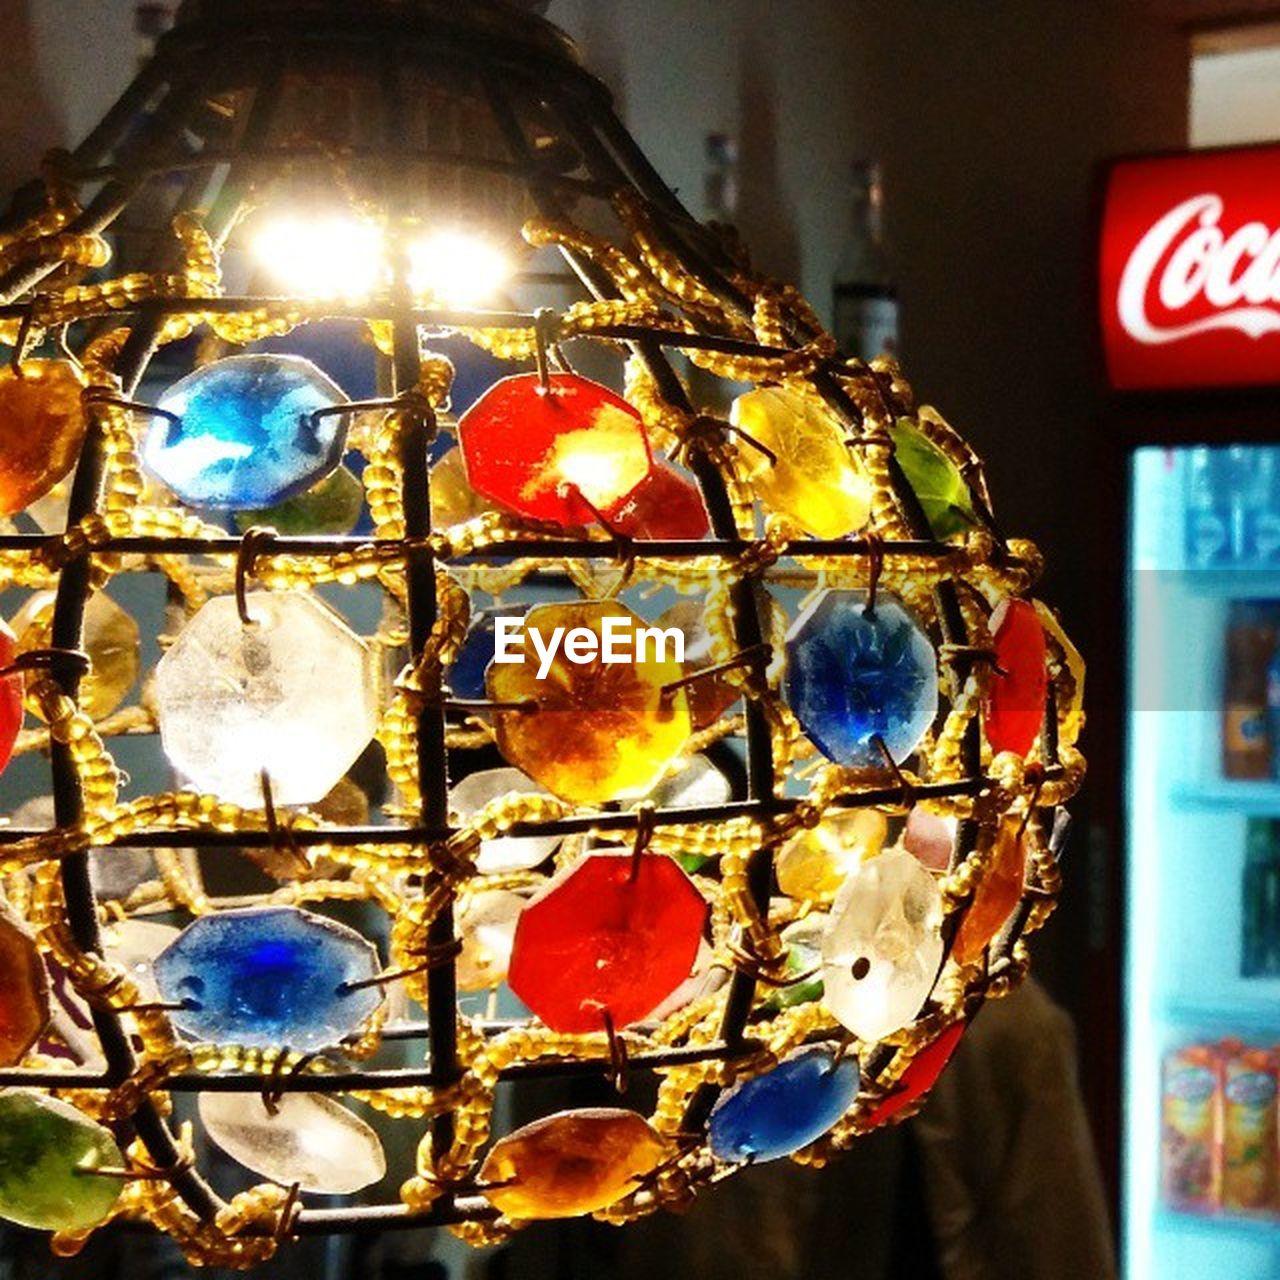 illuminated, close-up, lighting equipment, indoors, hanging, no people, focus on foreground, christmas decoration, night